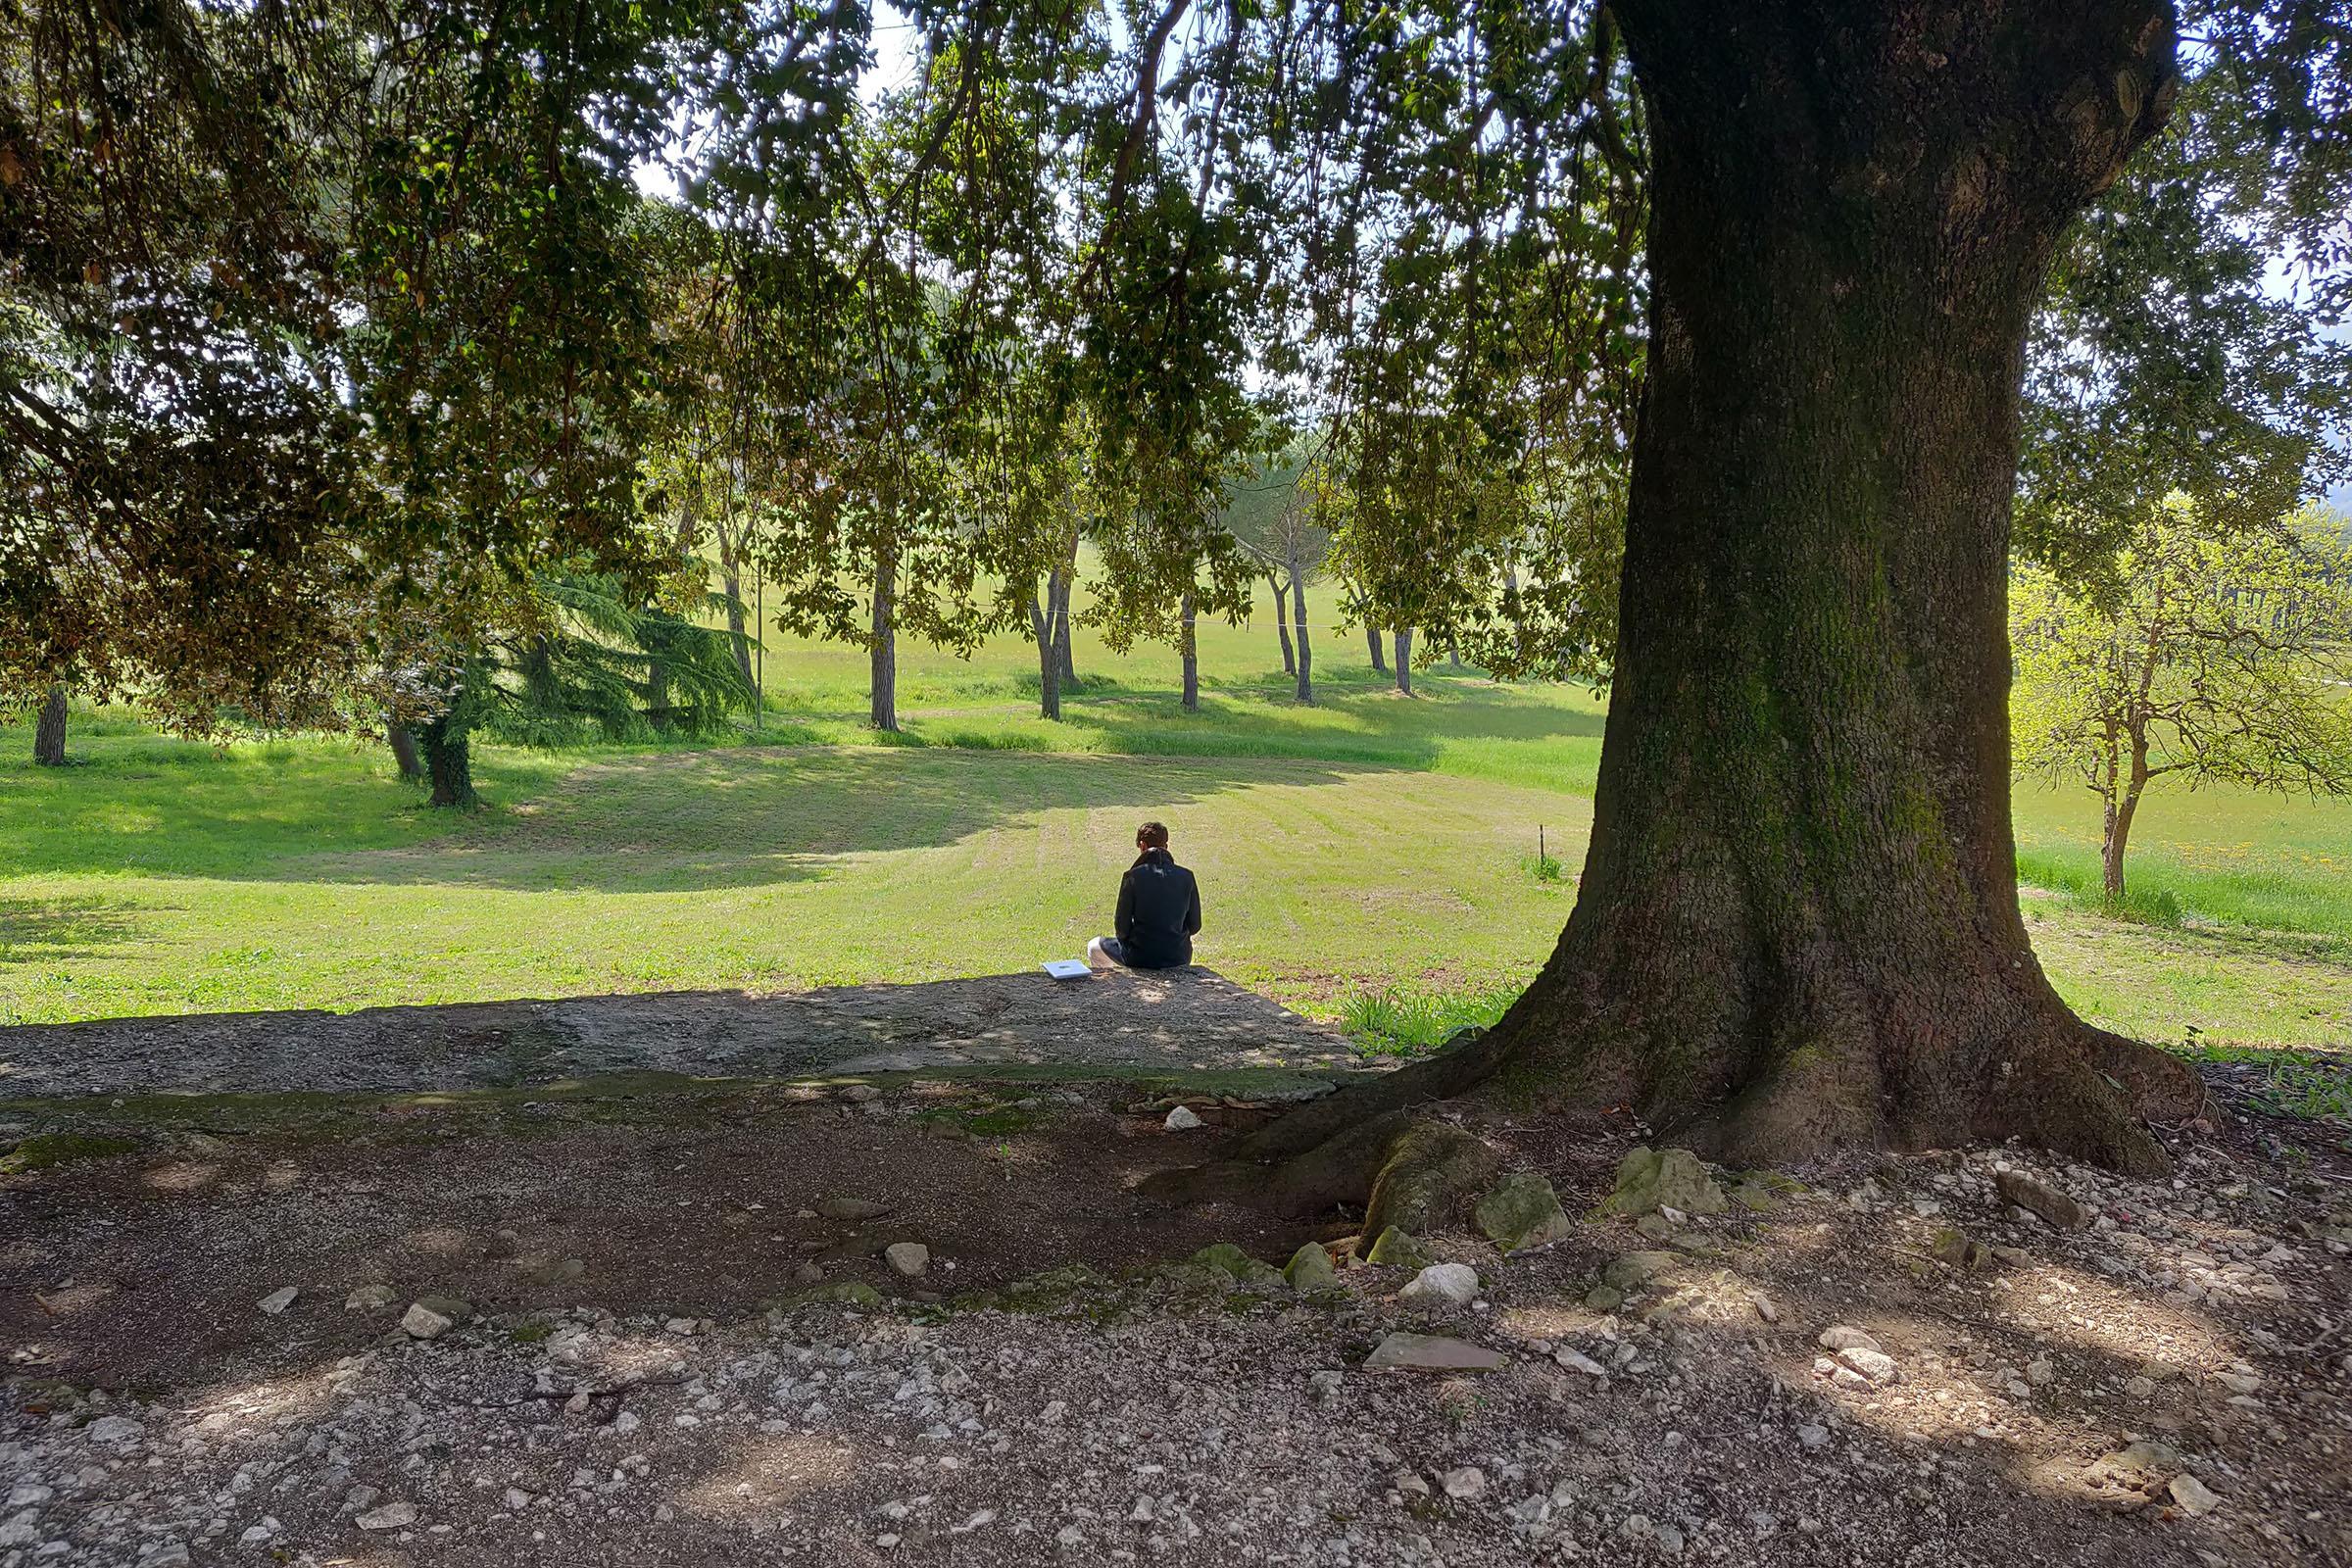 Osoba sidi u zelenom pod drivom